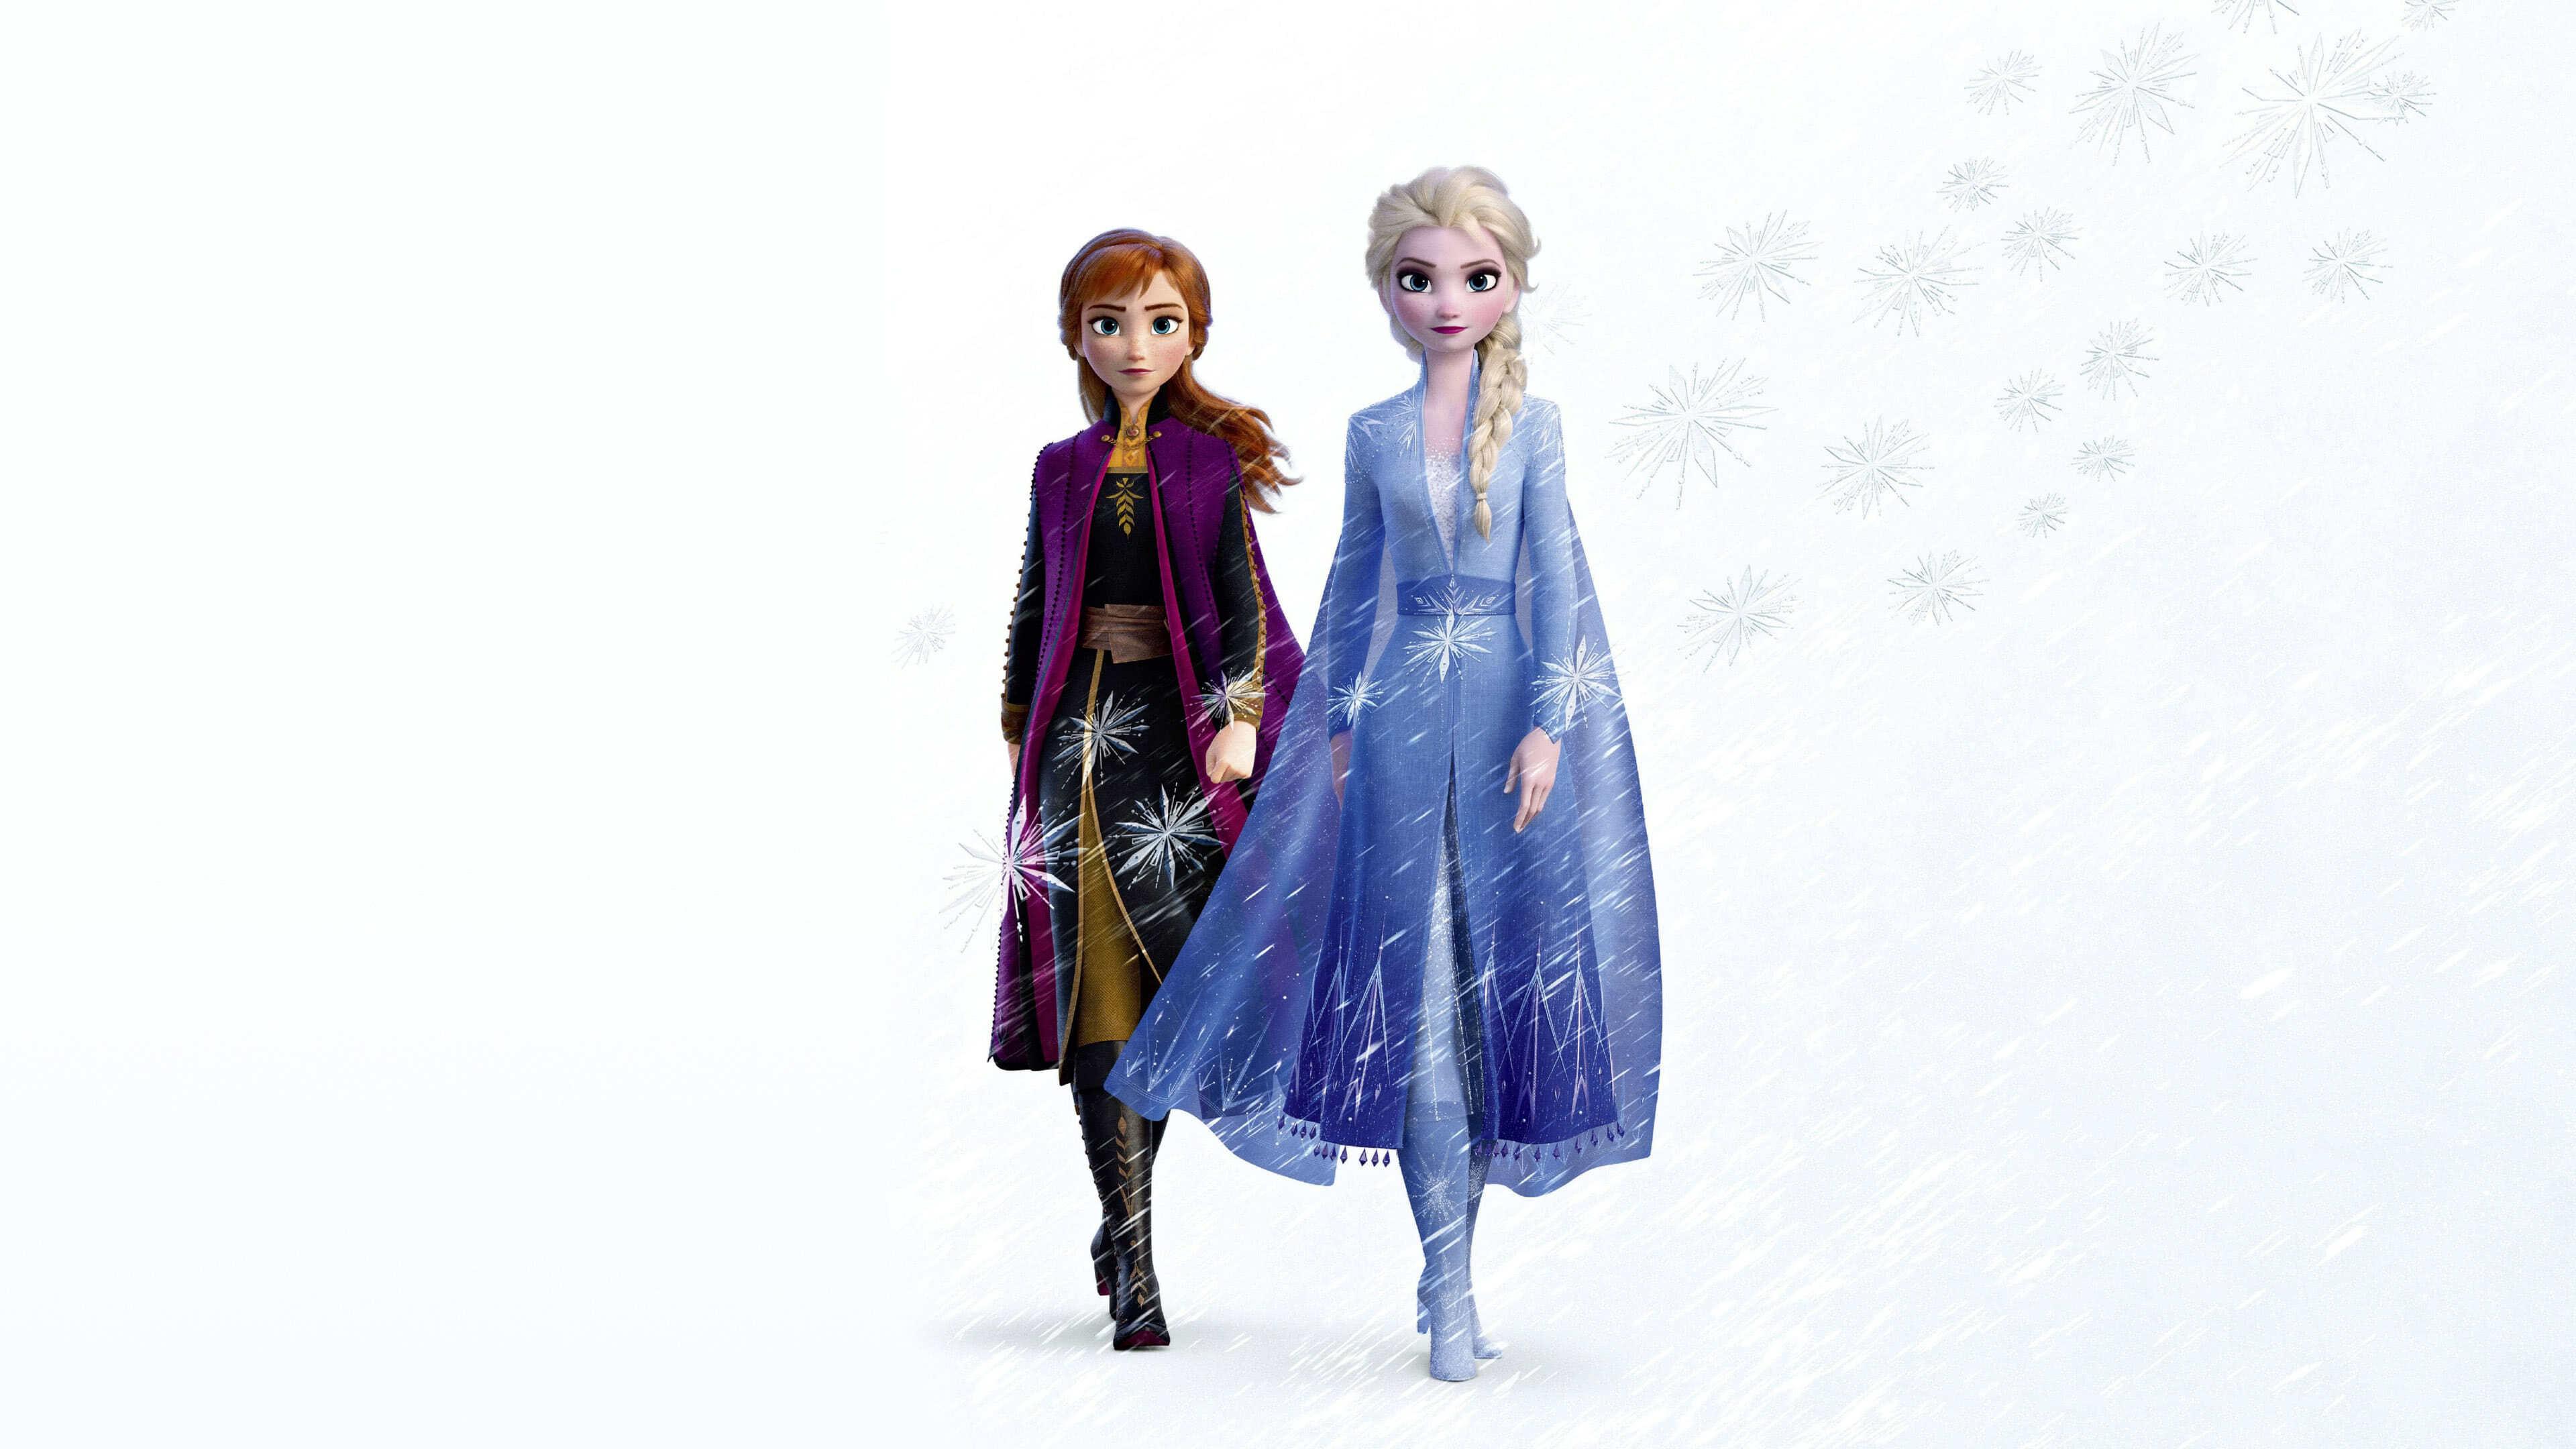 frozen 2 elsa and anna uhd 4k wallpaper